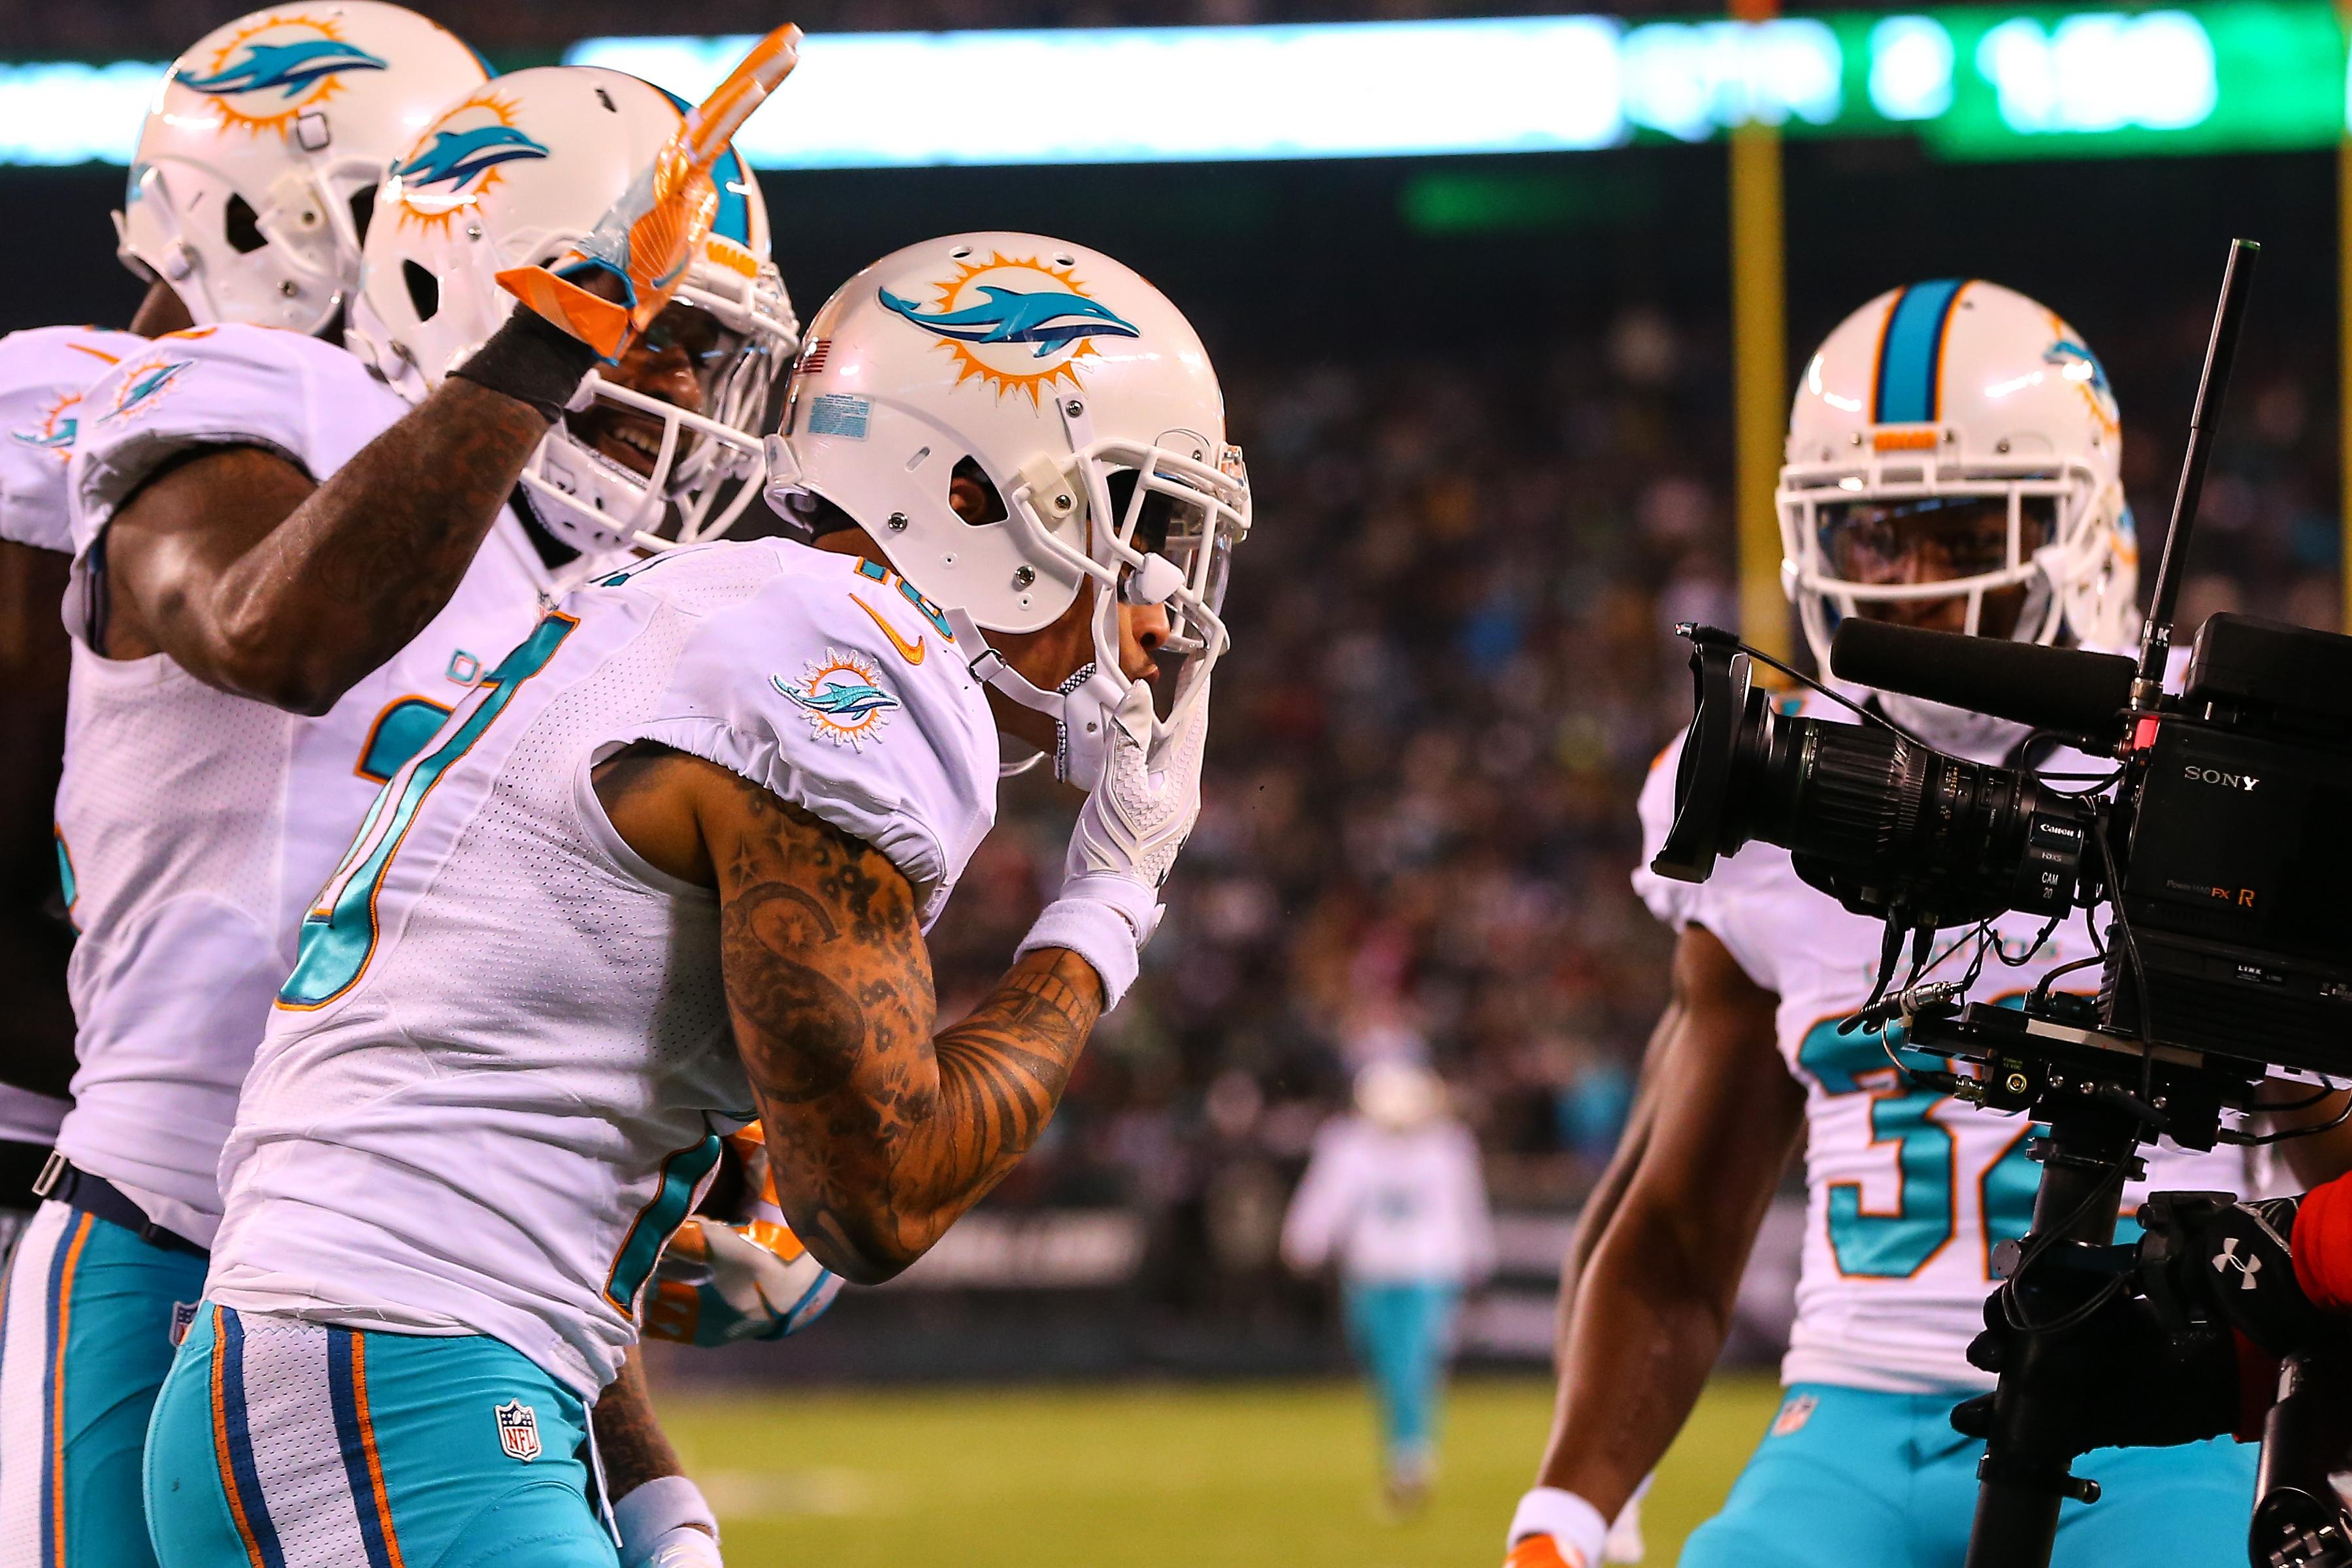 NFL: DEC 17 Dolphins at Jets